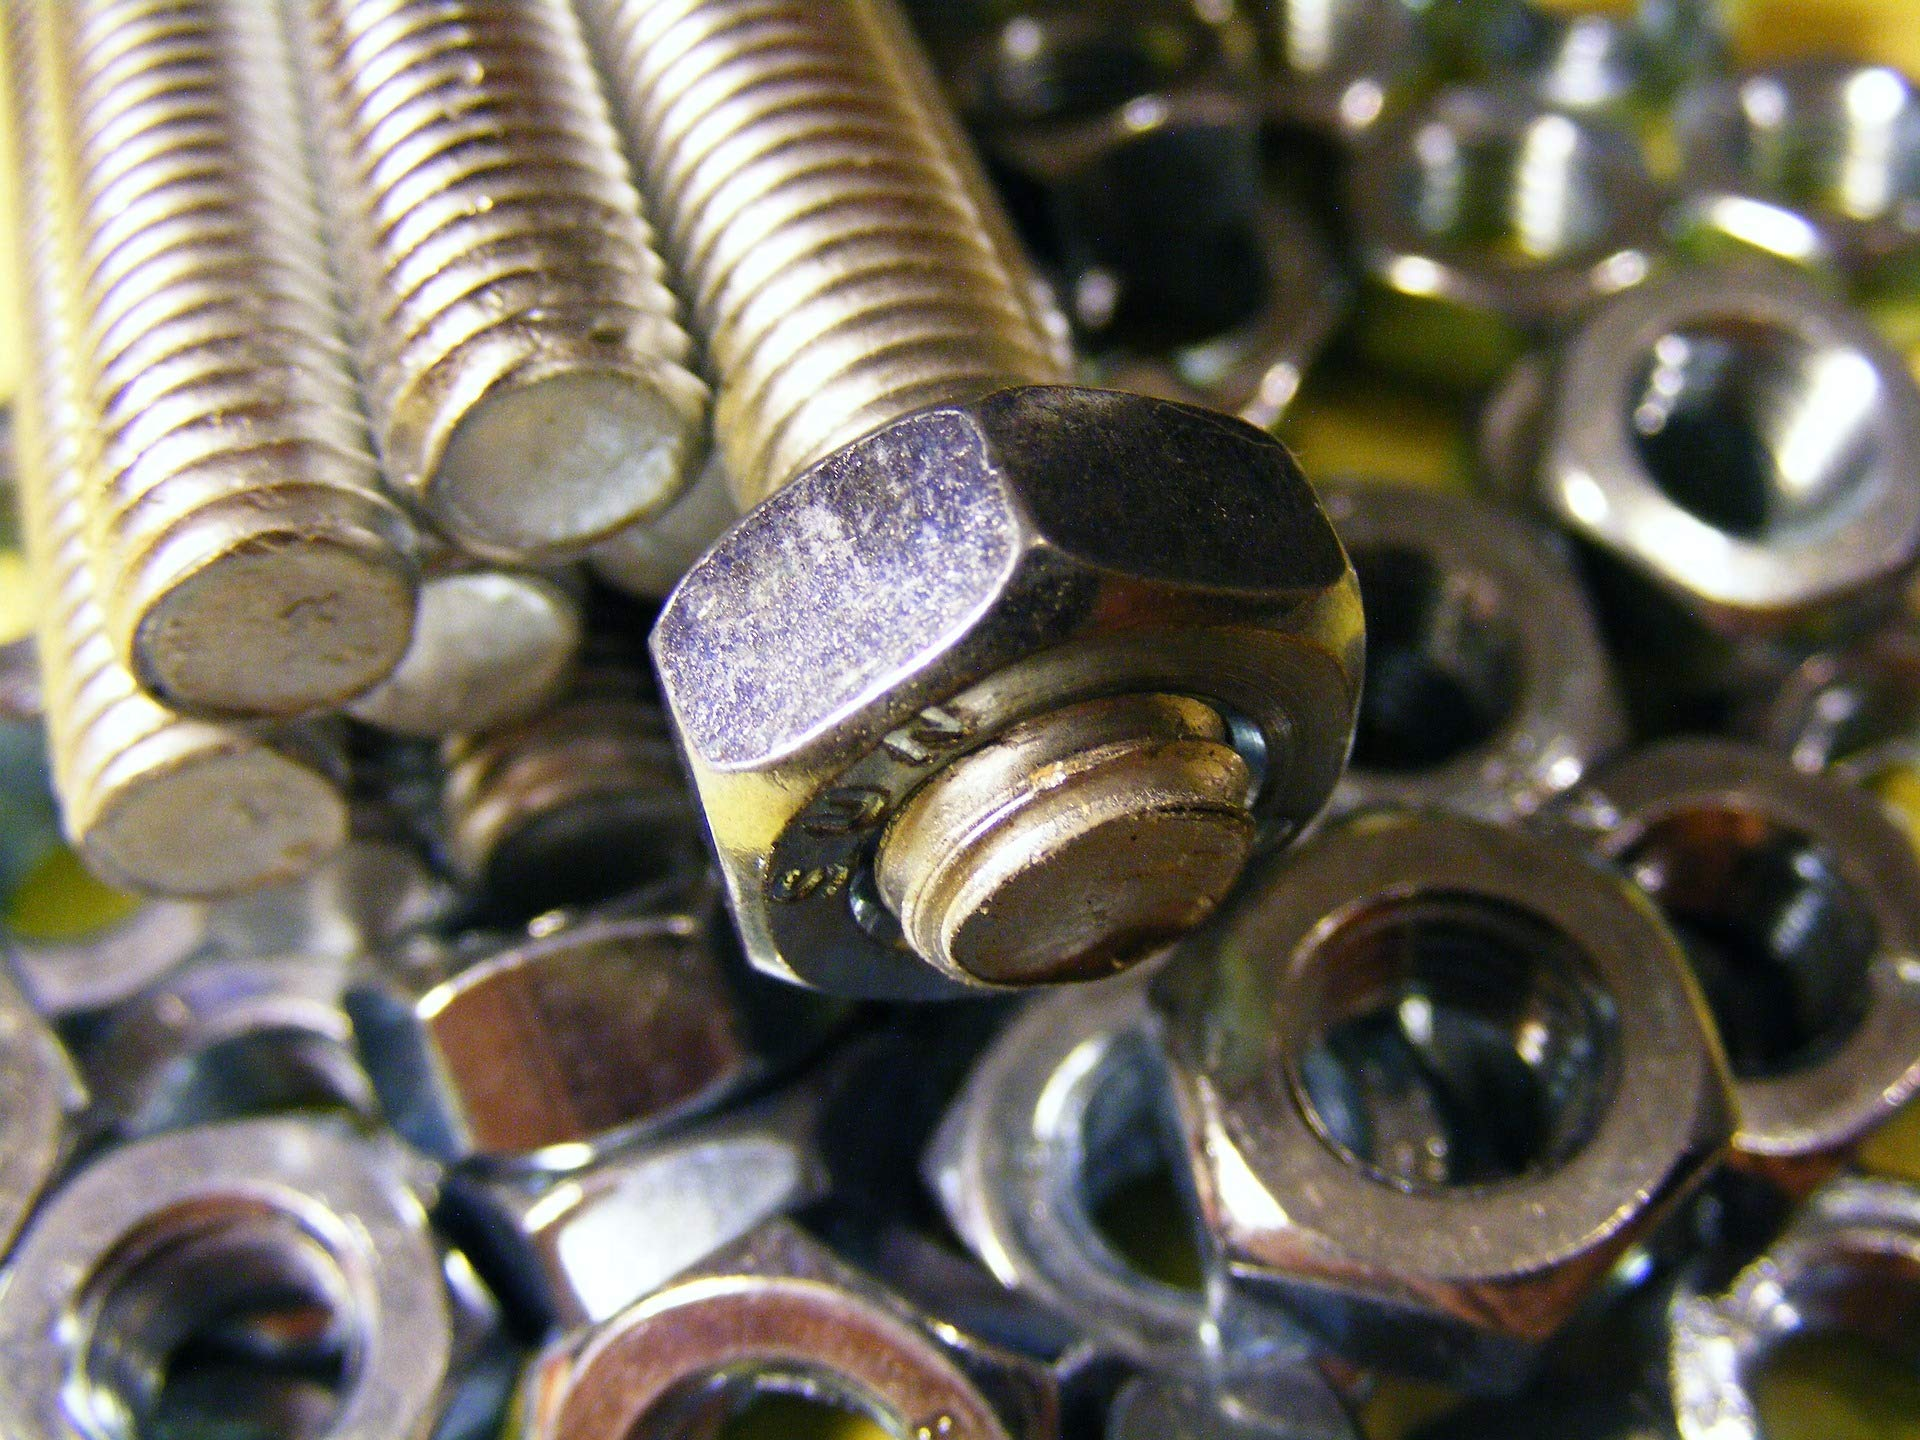 Ruddman Supplies - SAE Standard Assorted Nut and Bolt Hardware Set with Hard Plastic Organizing Case - 240 Piece Set by Ruddman Supplies (Image #6)